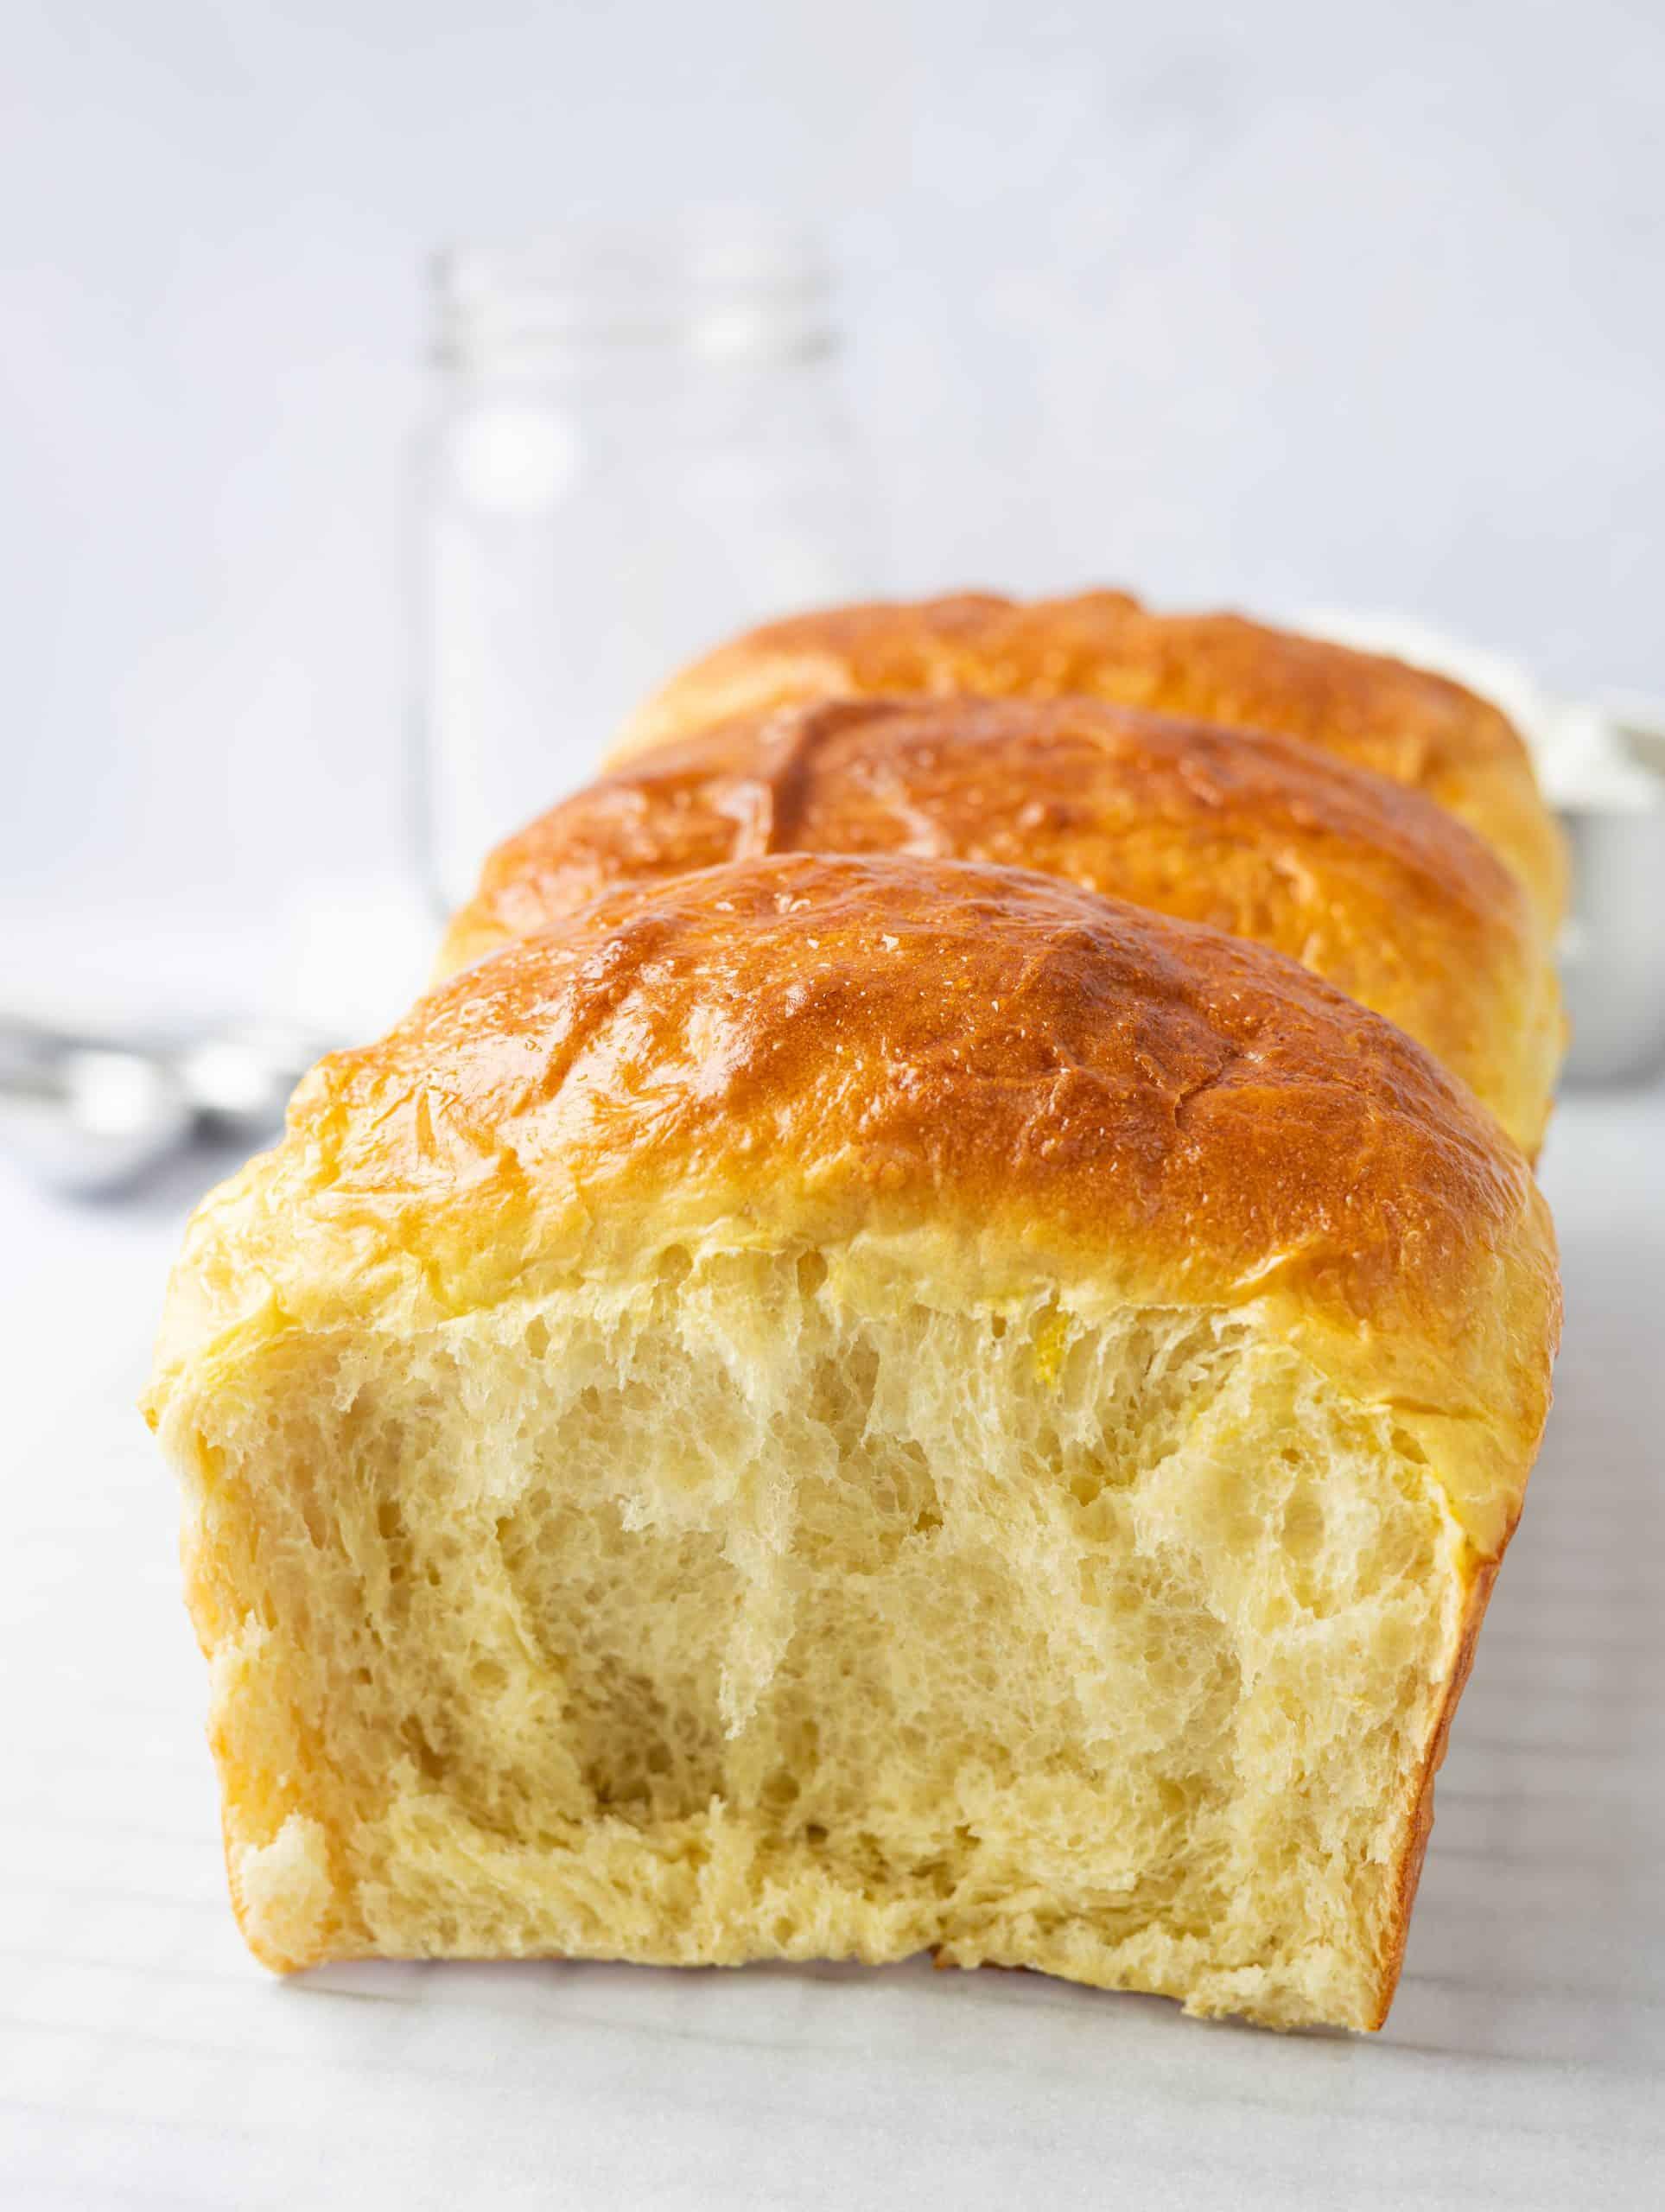 Tangzhong Bread (Dairy-Free)